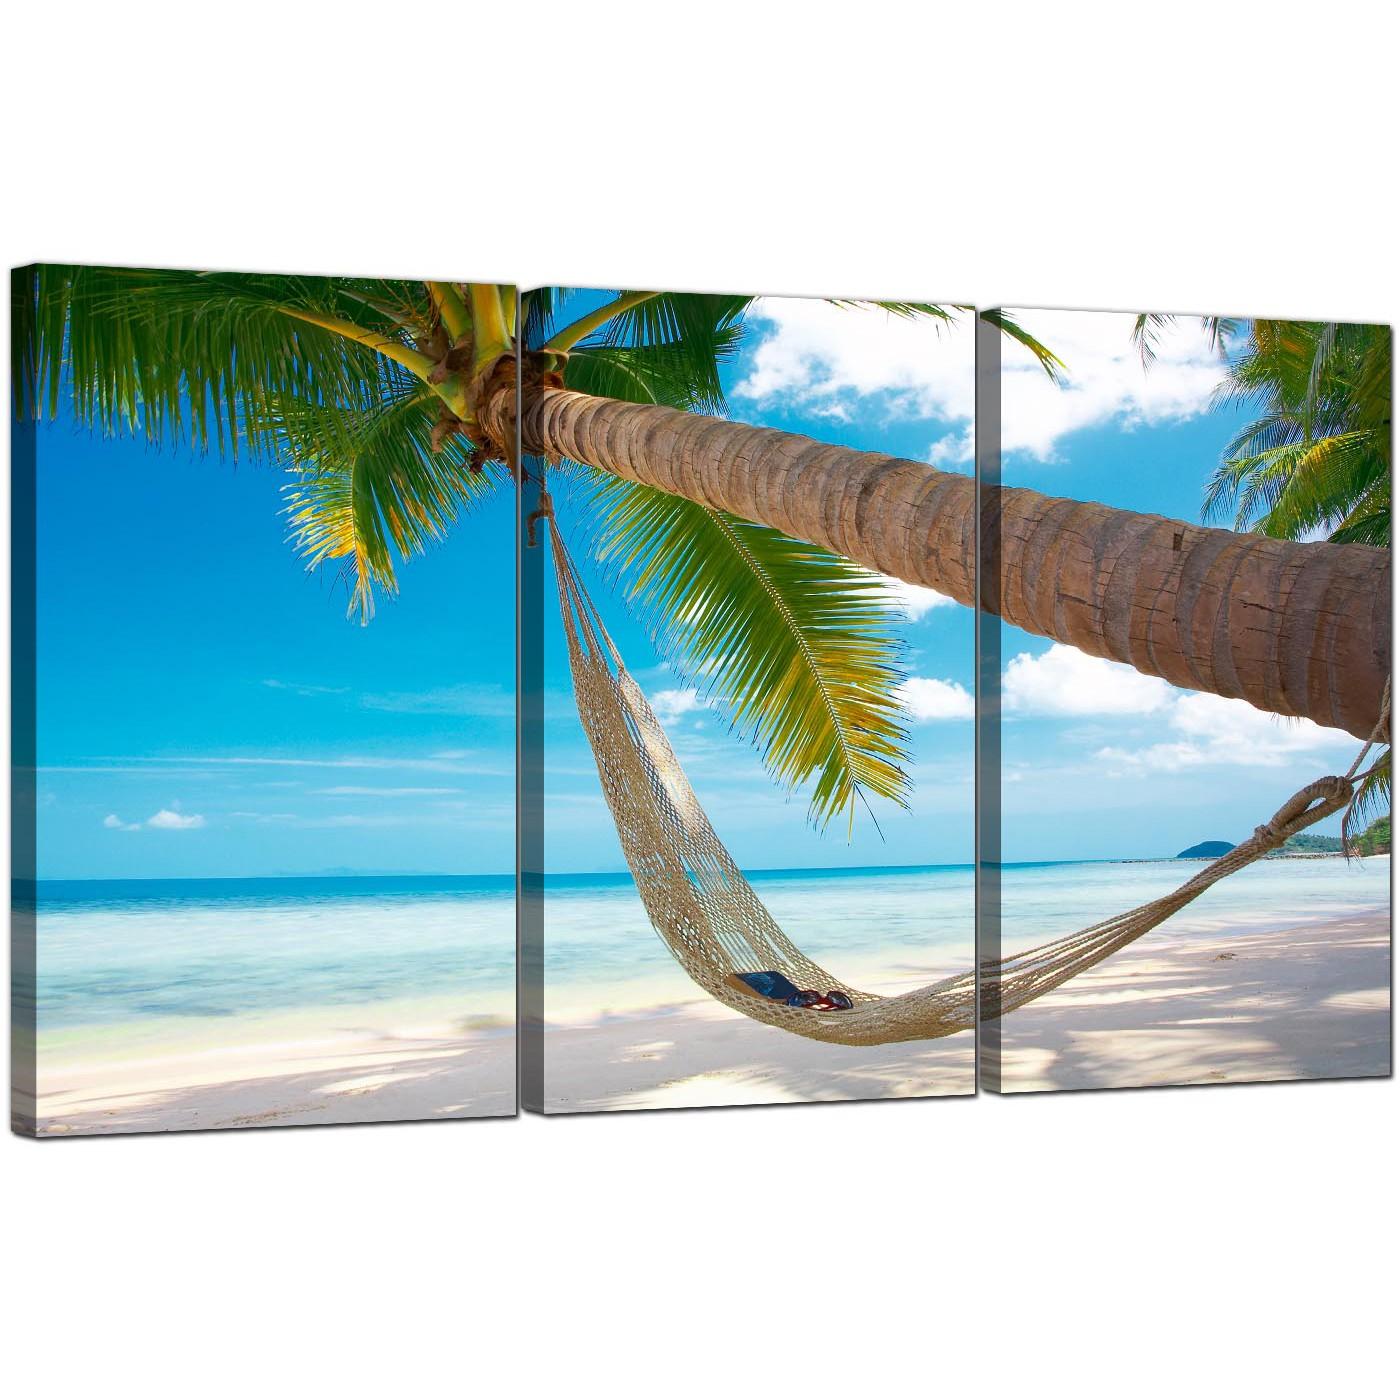 Display Gallery Item 5 3 Panel Seascape Canvas Prints Palm Tree 3039 Display Gallery Item 6